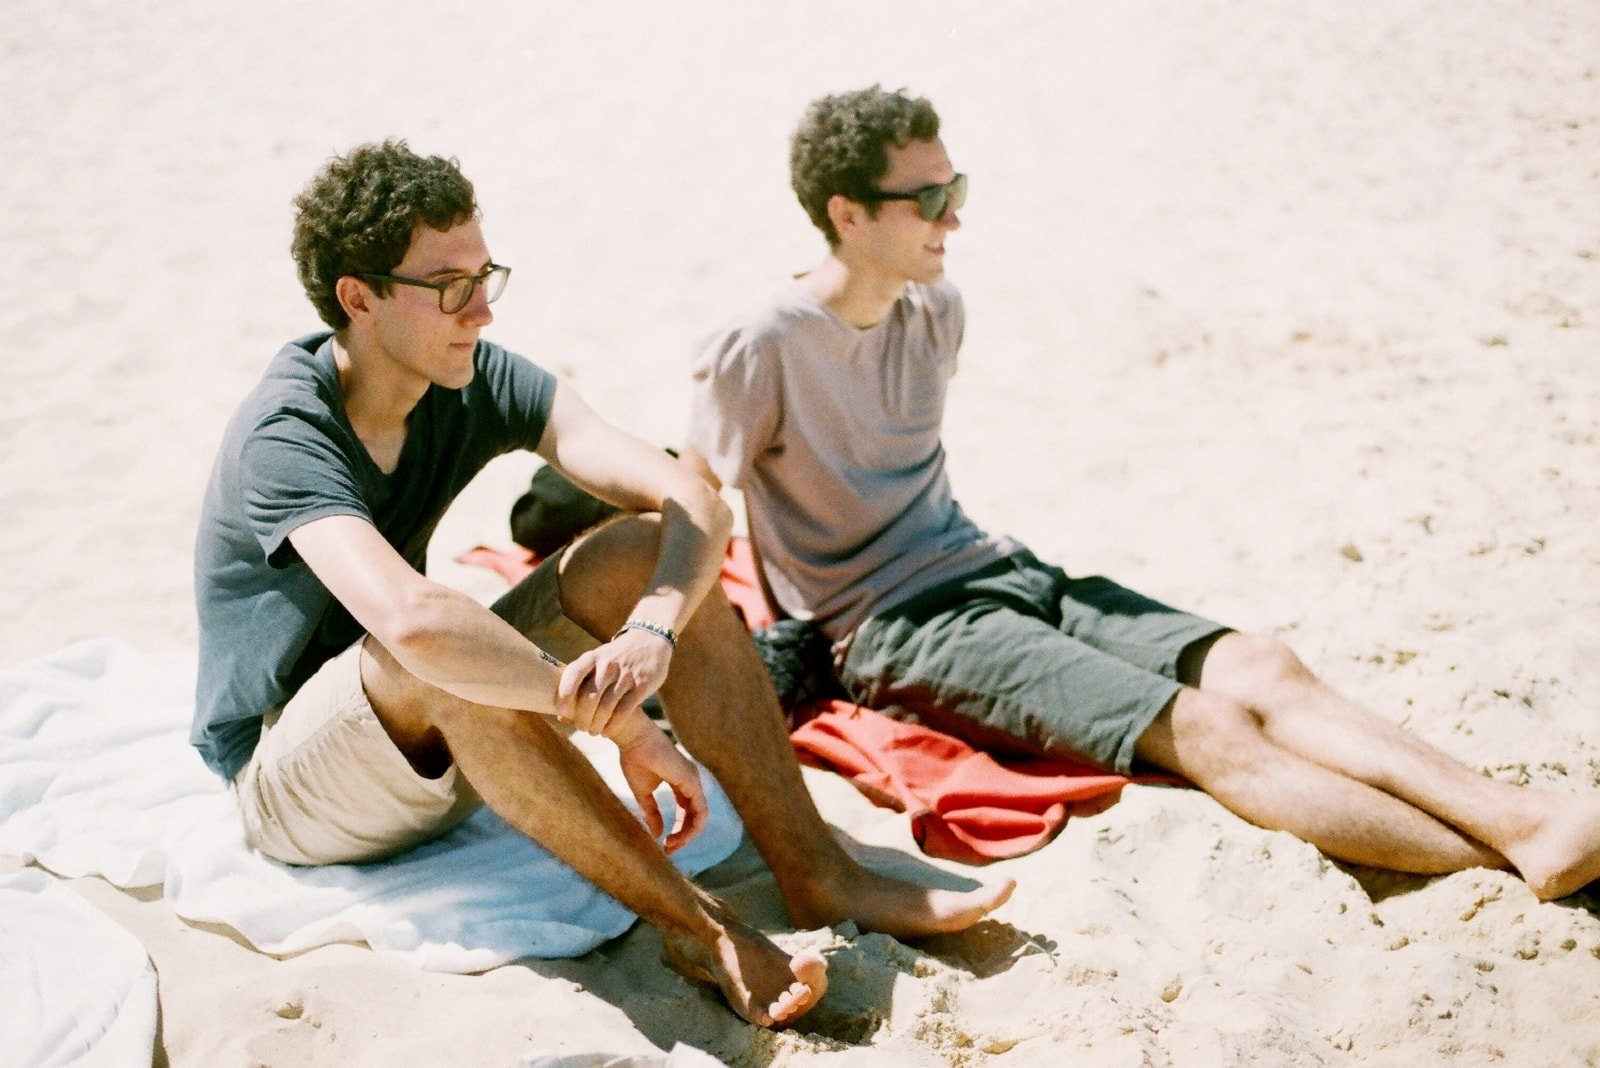 two men sitting on beach during daytime